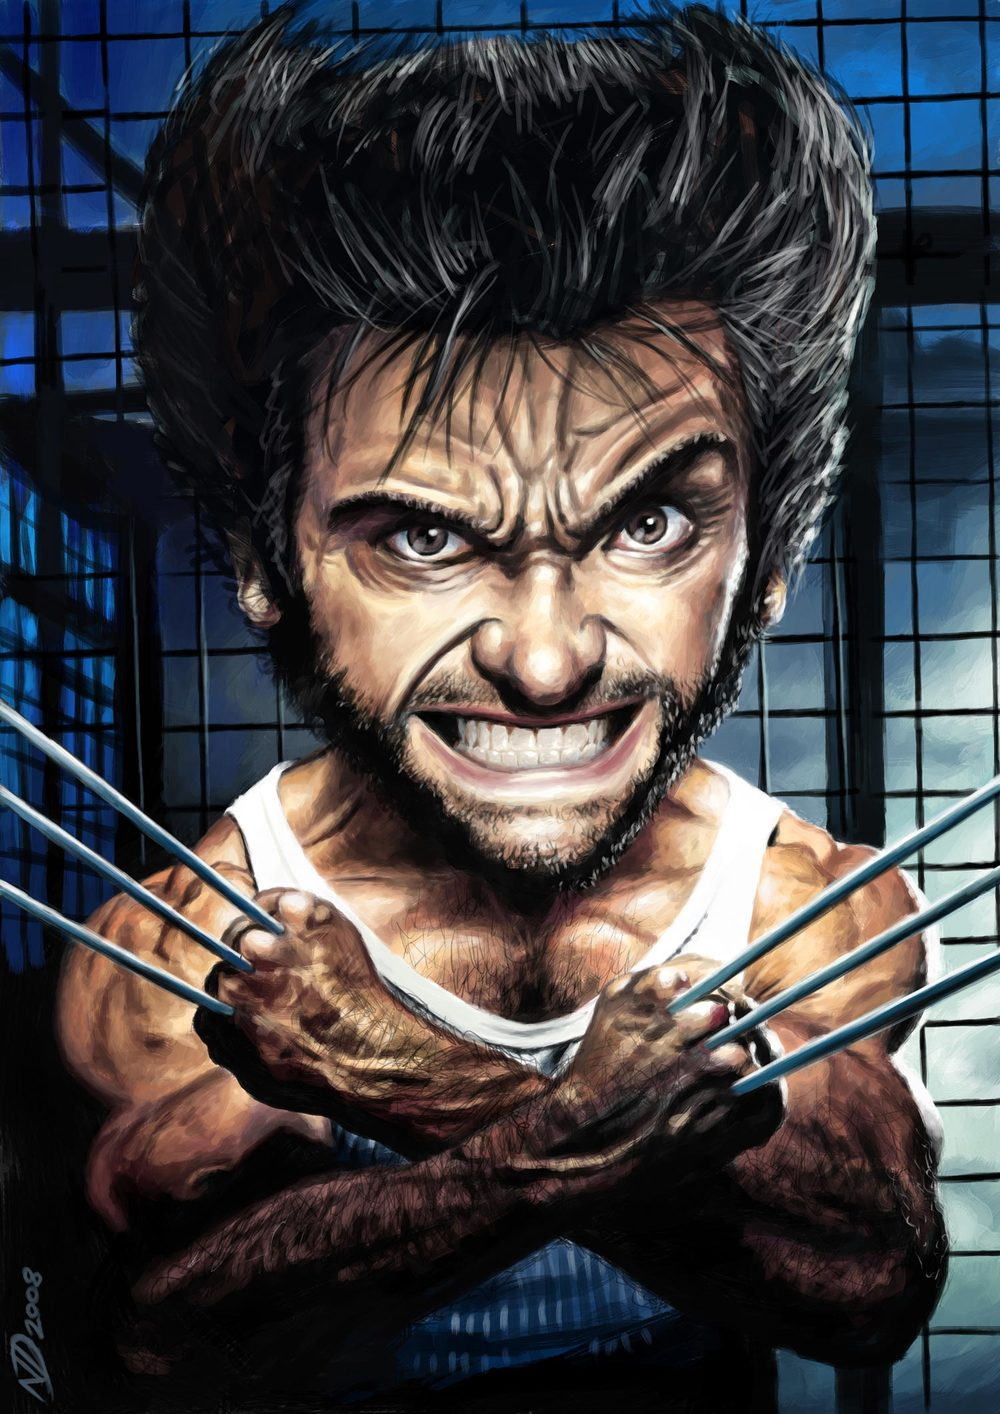 Hugh Jackman / Wolverine (X-Men) by Neil Davies